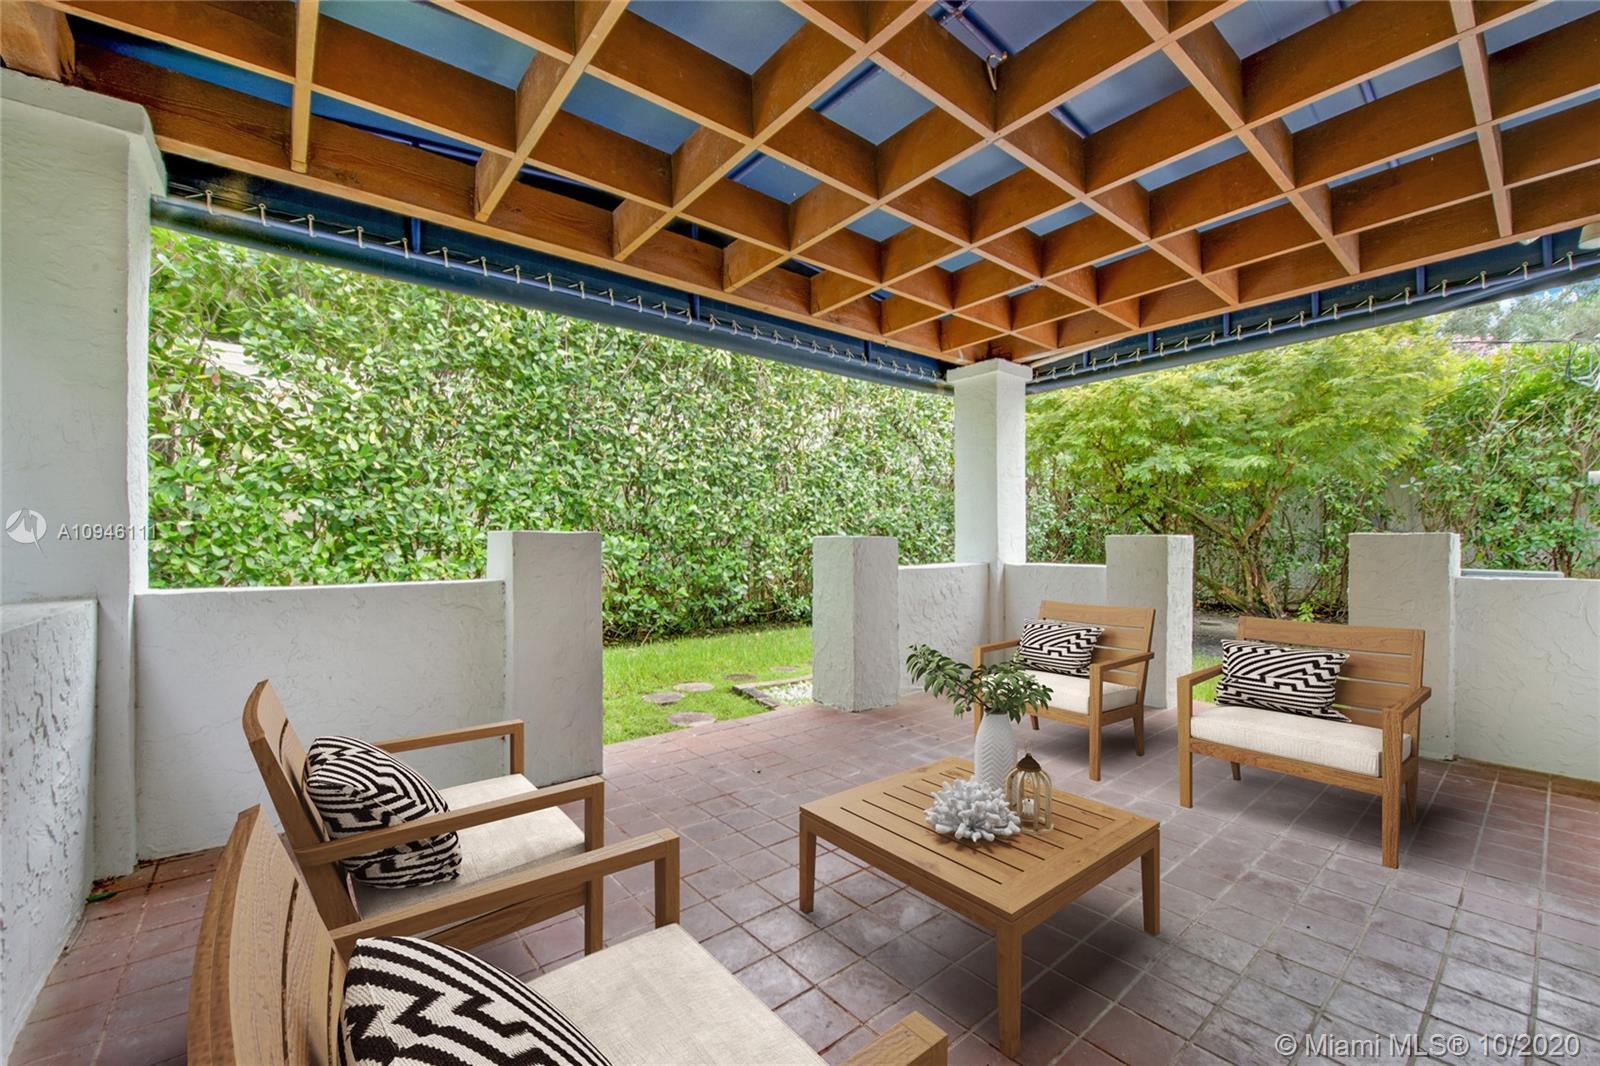 South Miami - 4111 Alhambra Cir, Coral Gables, FL 33146